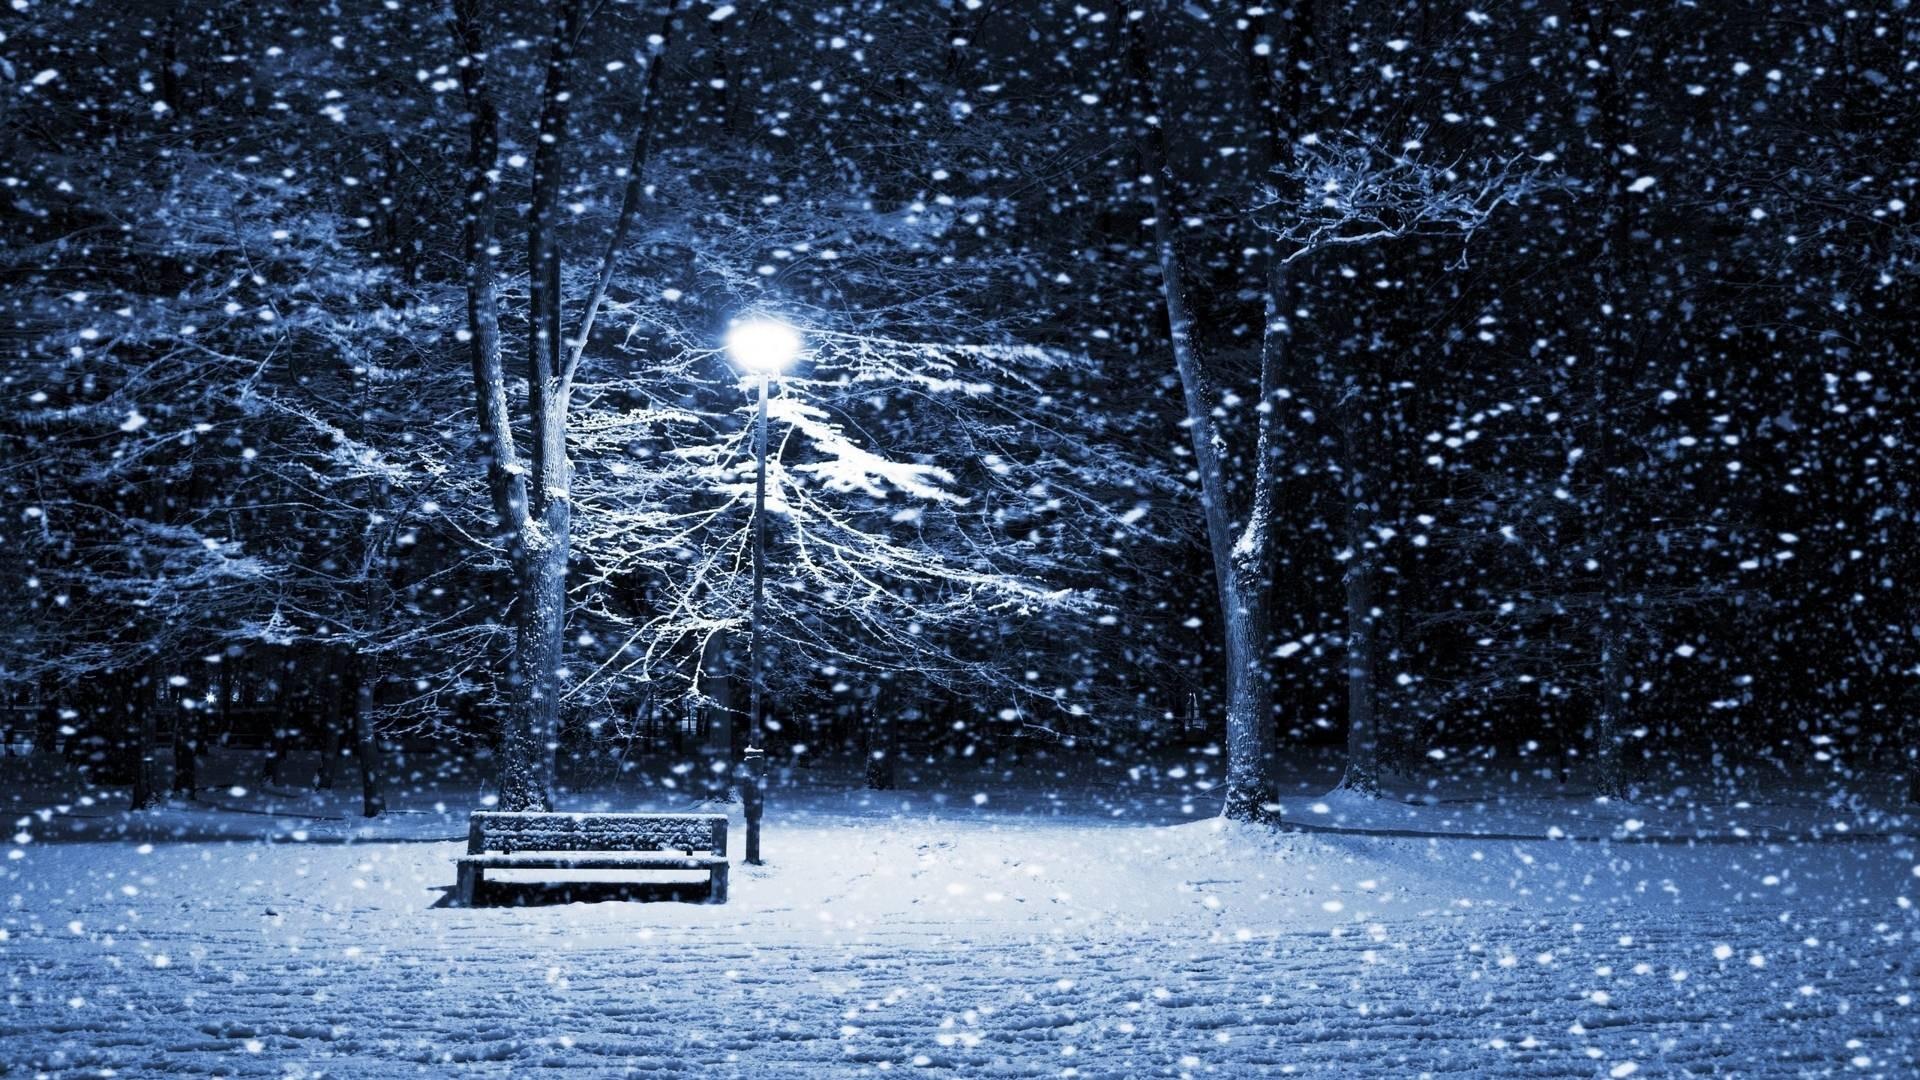 Winter Snow Scene Photography (id: 41878)   WallPho.com